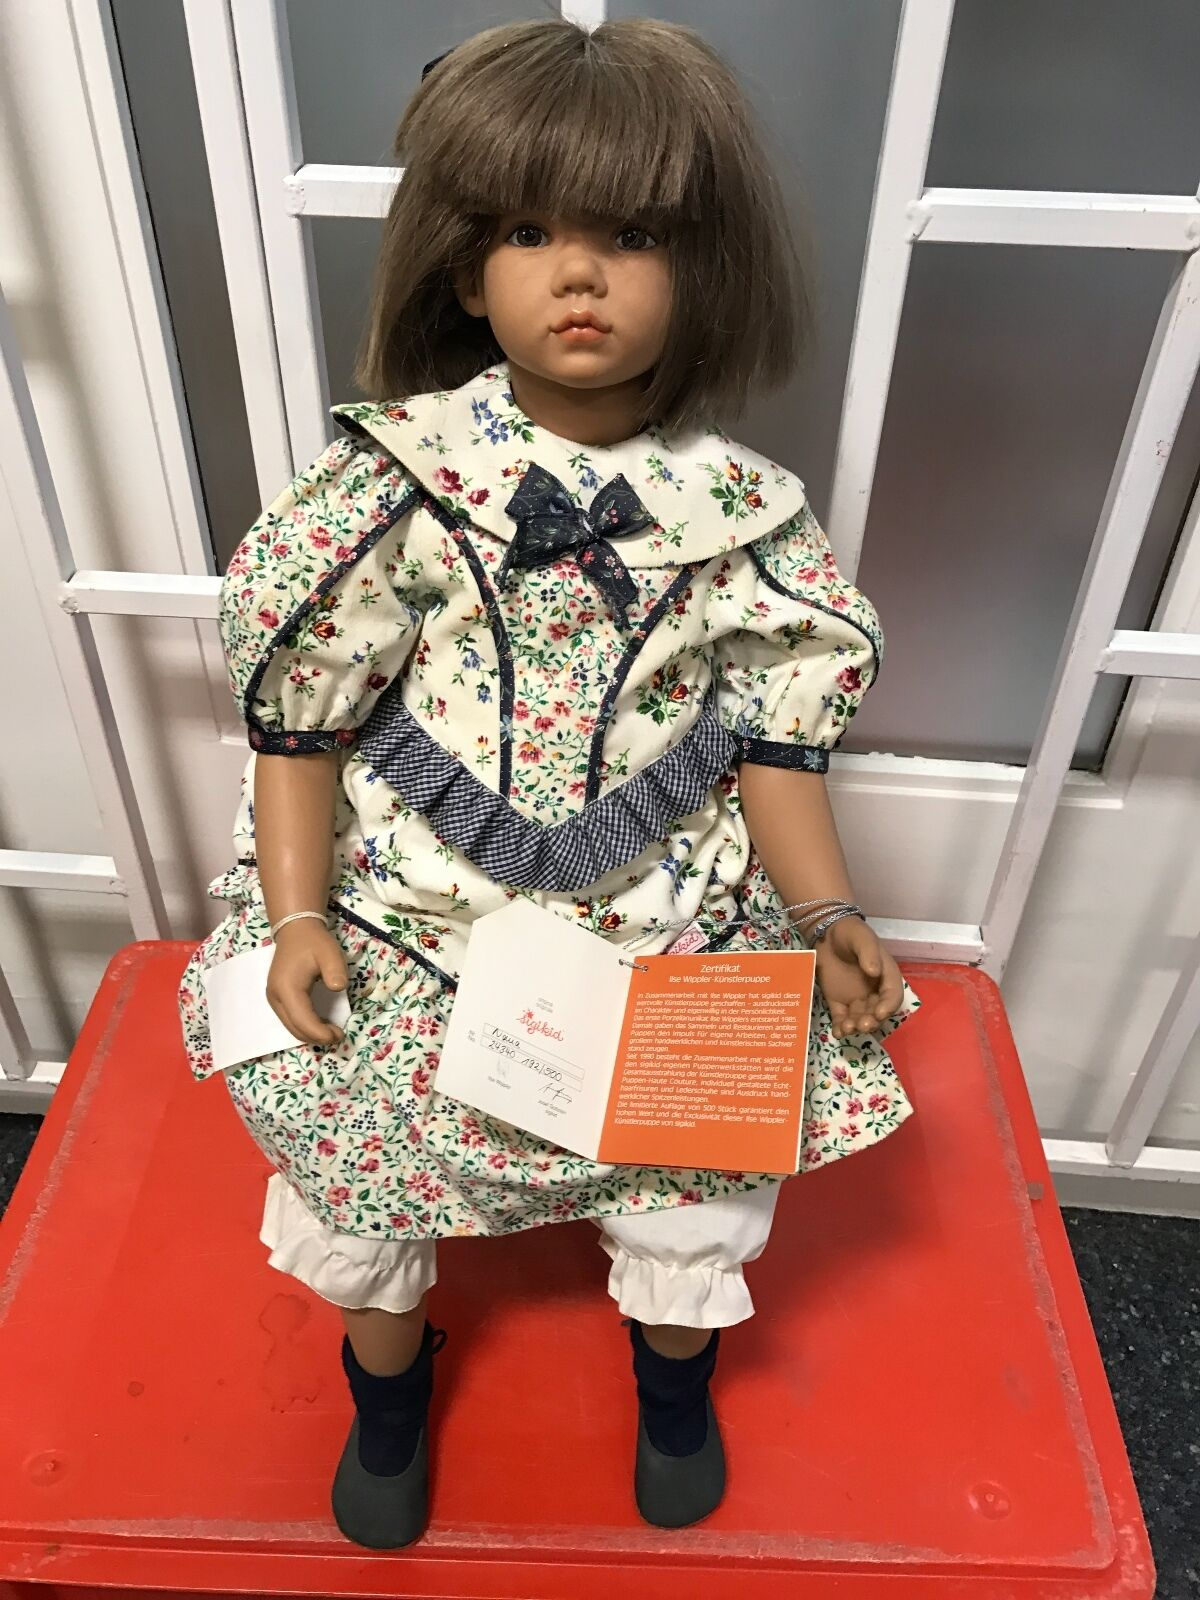 Ilse Wippler vinile bambola nana 62 CM. OTTIMO stato.